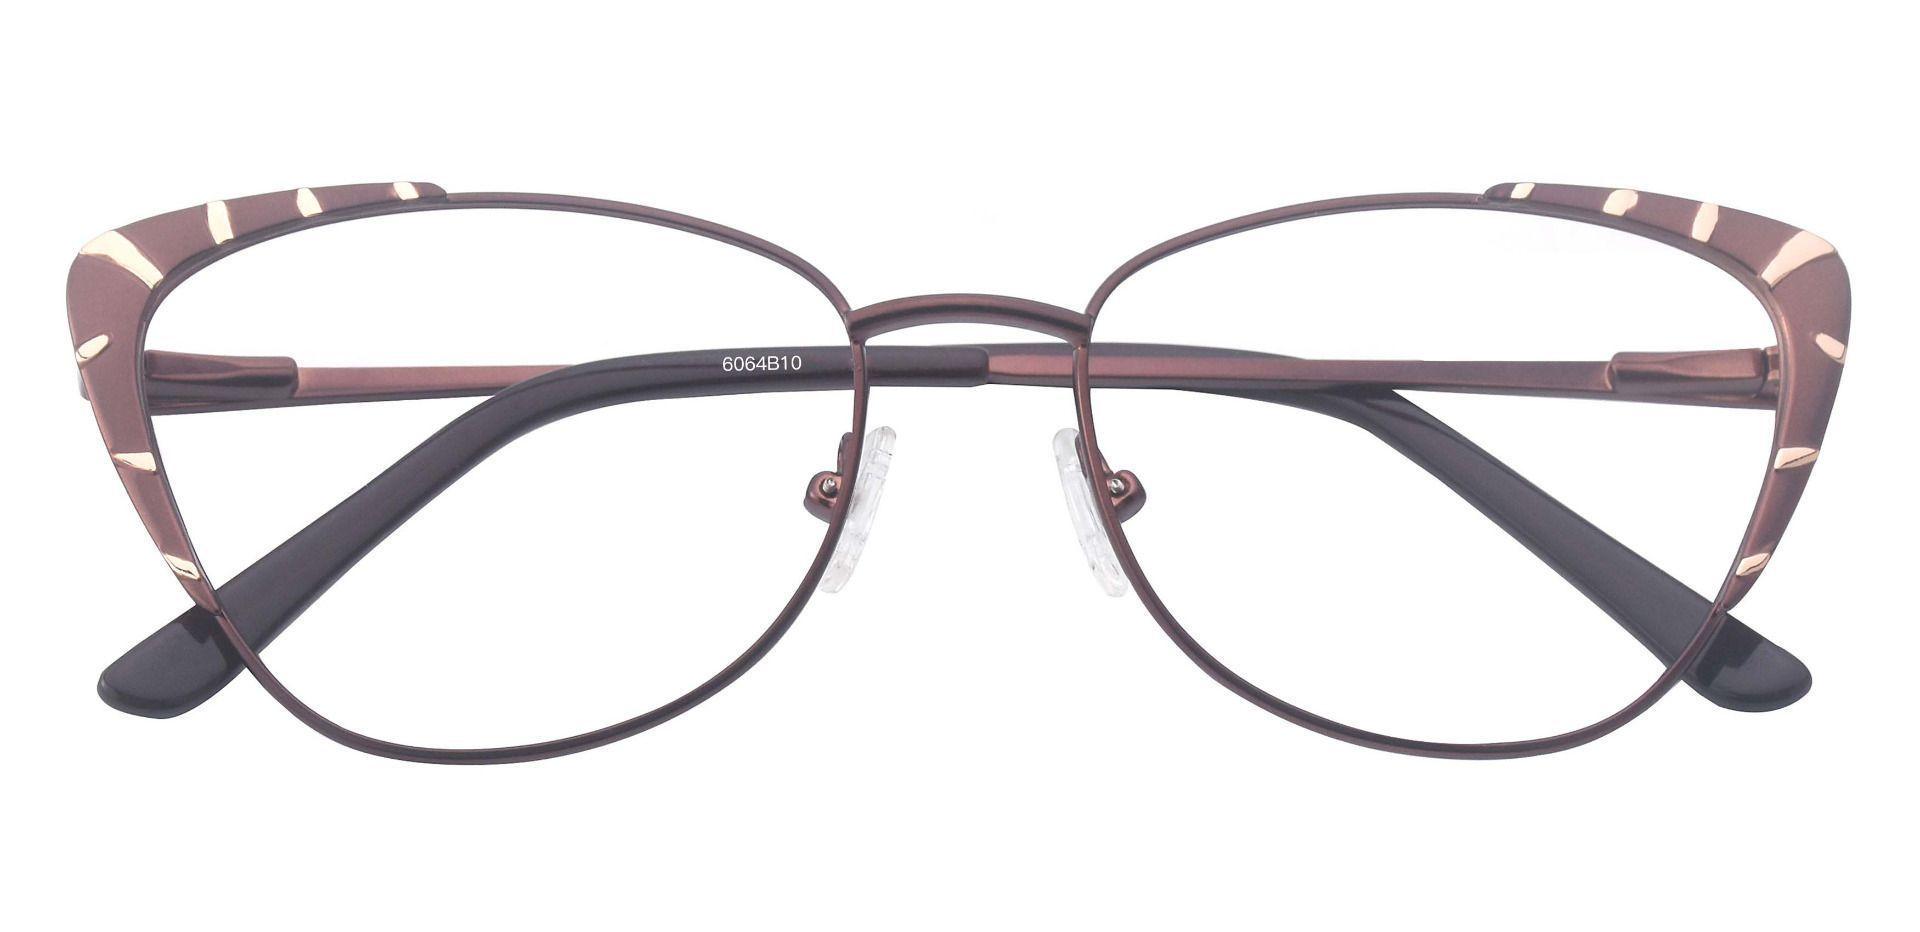 Gabrielle Cat Eye Lined Bifocal Glasses - Brown